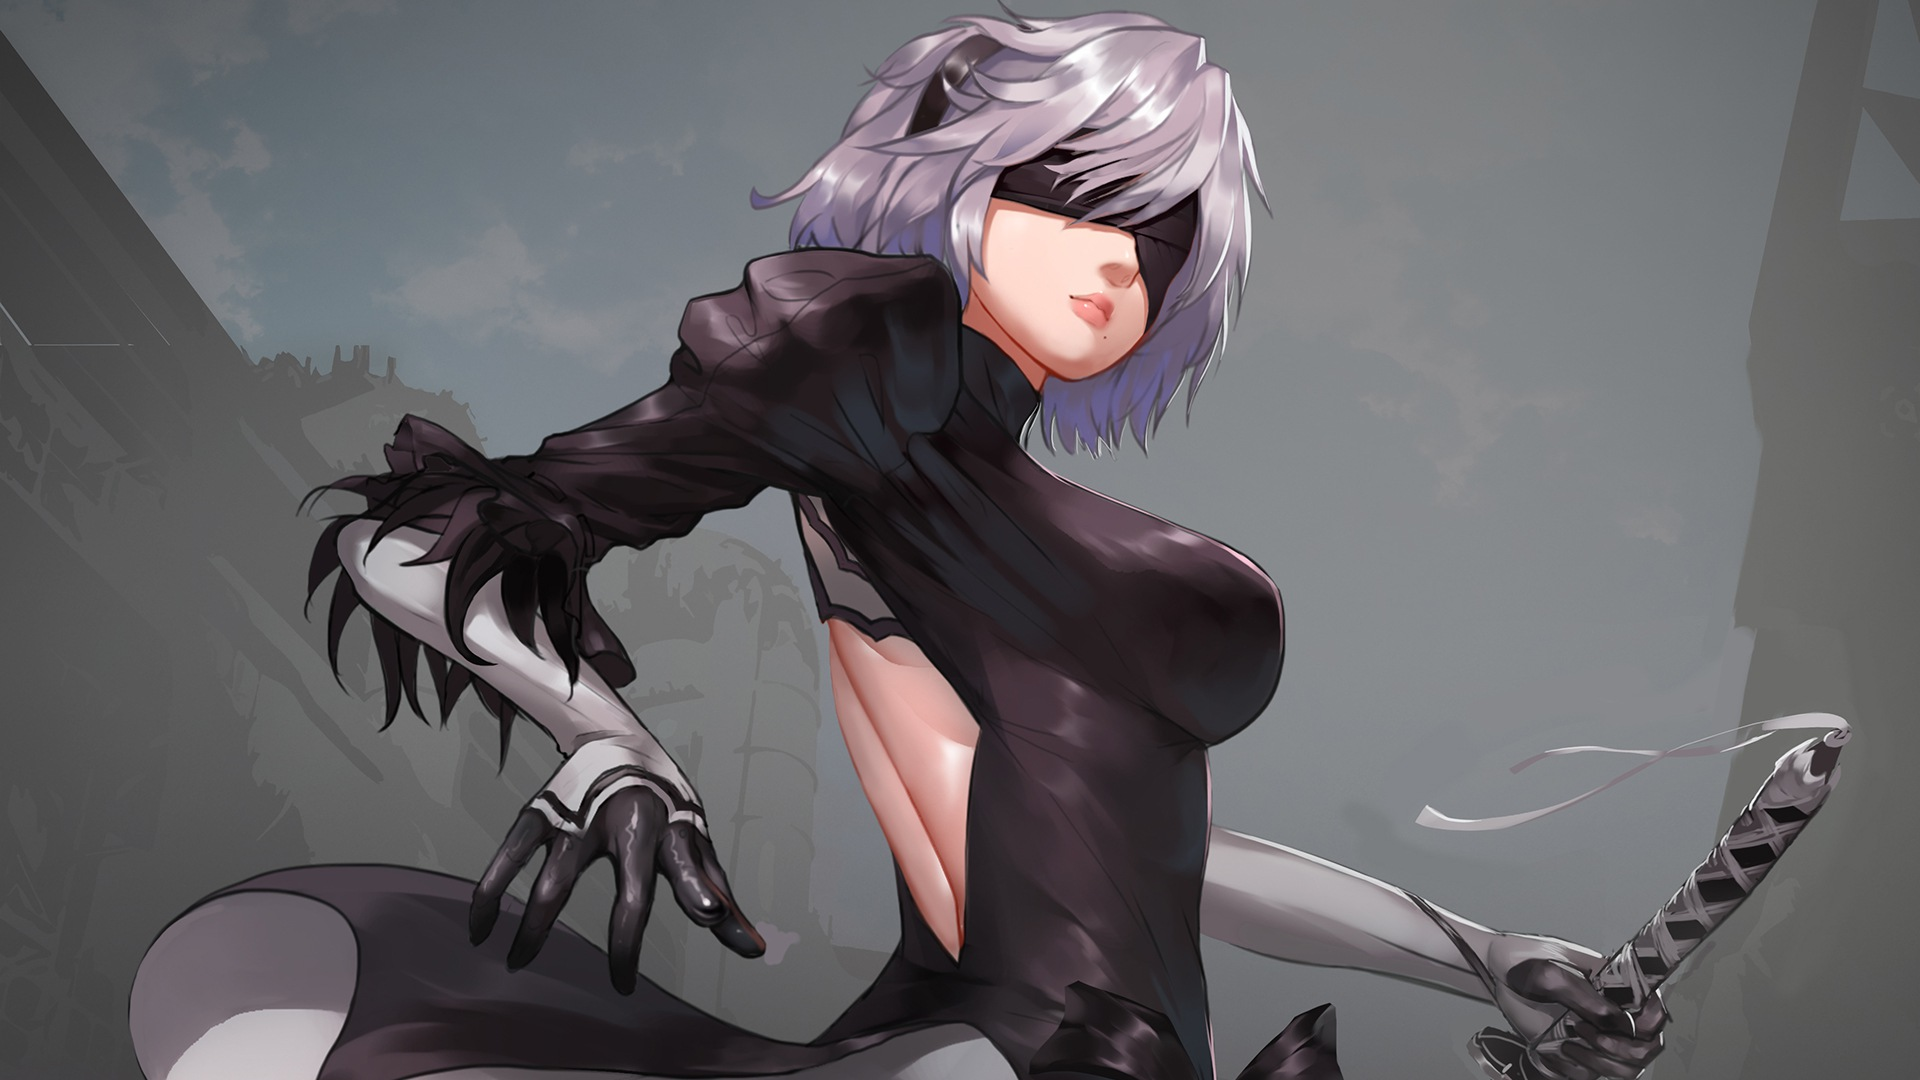 #3001251 1920x1240 Girl, Katana, NieR: Automata, Orb